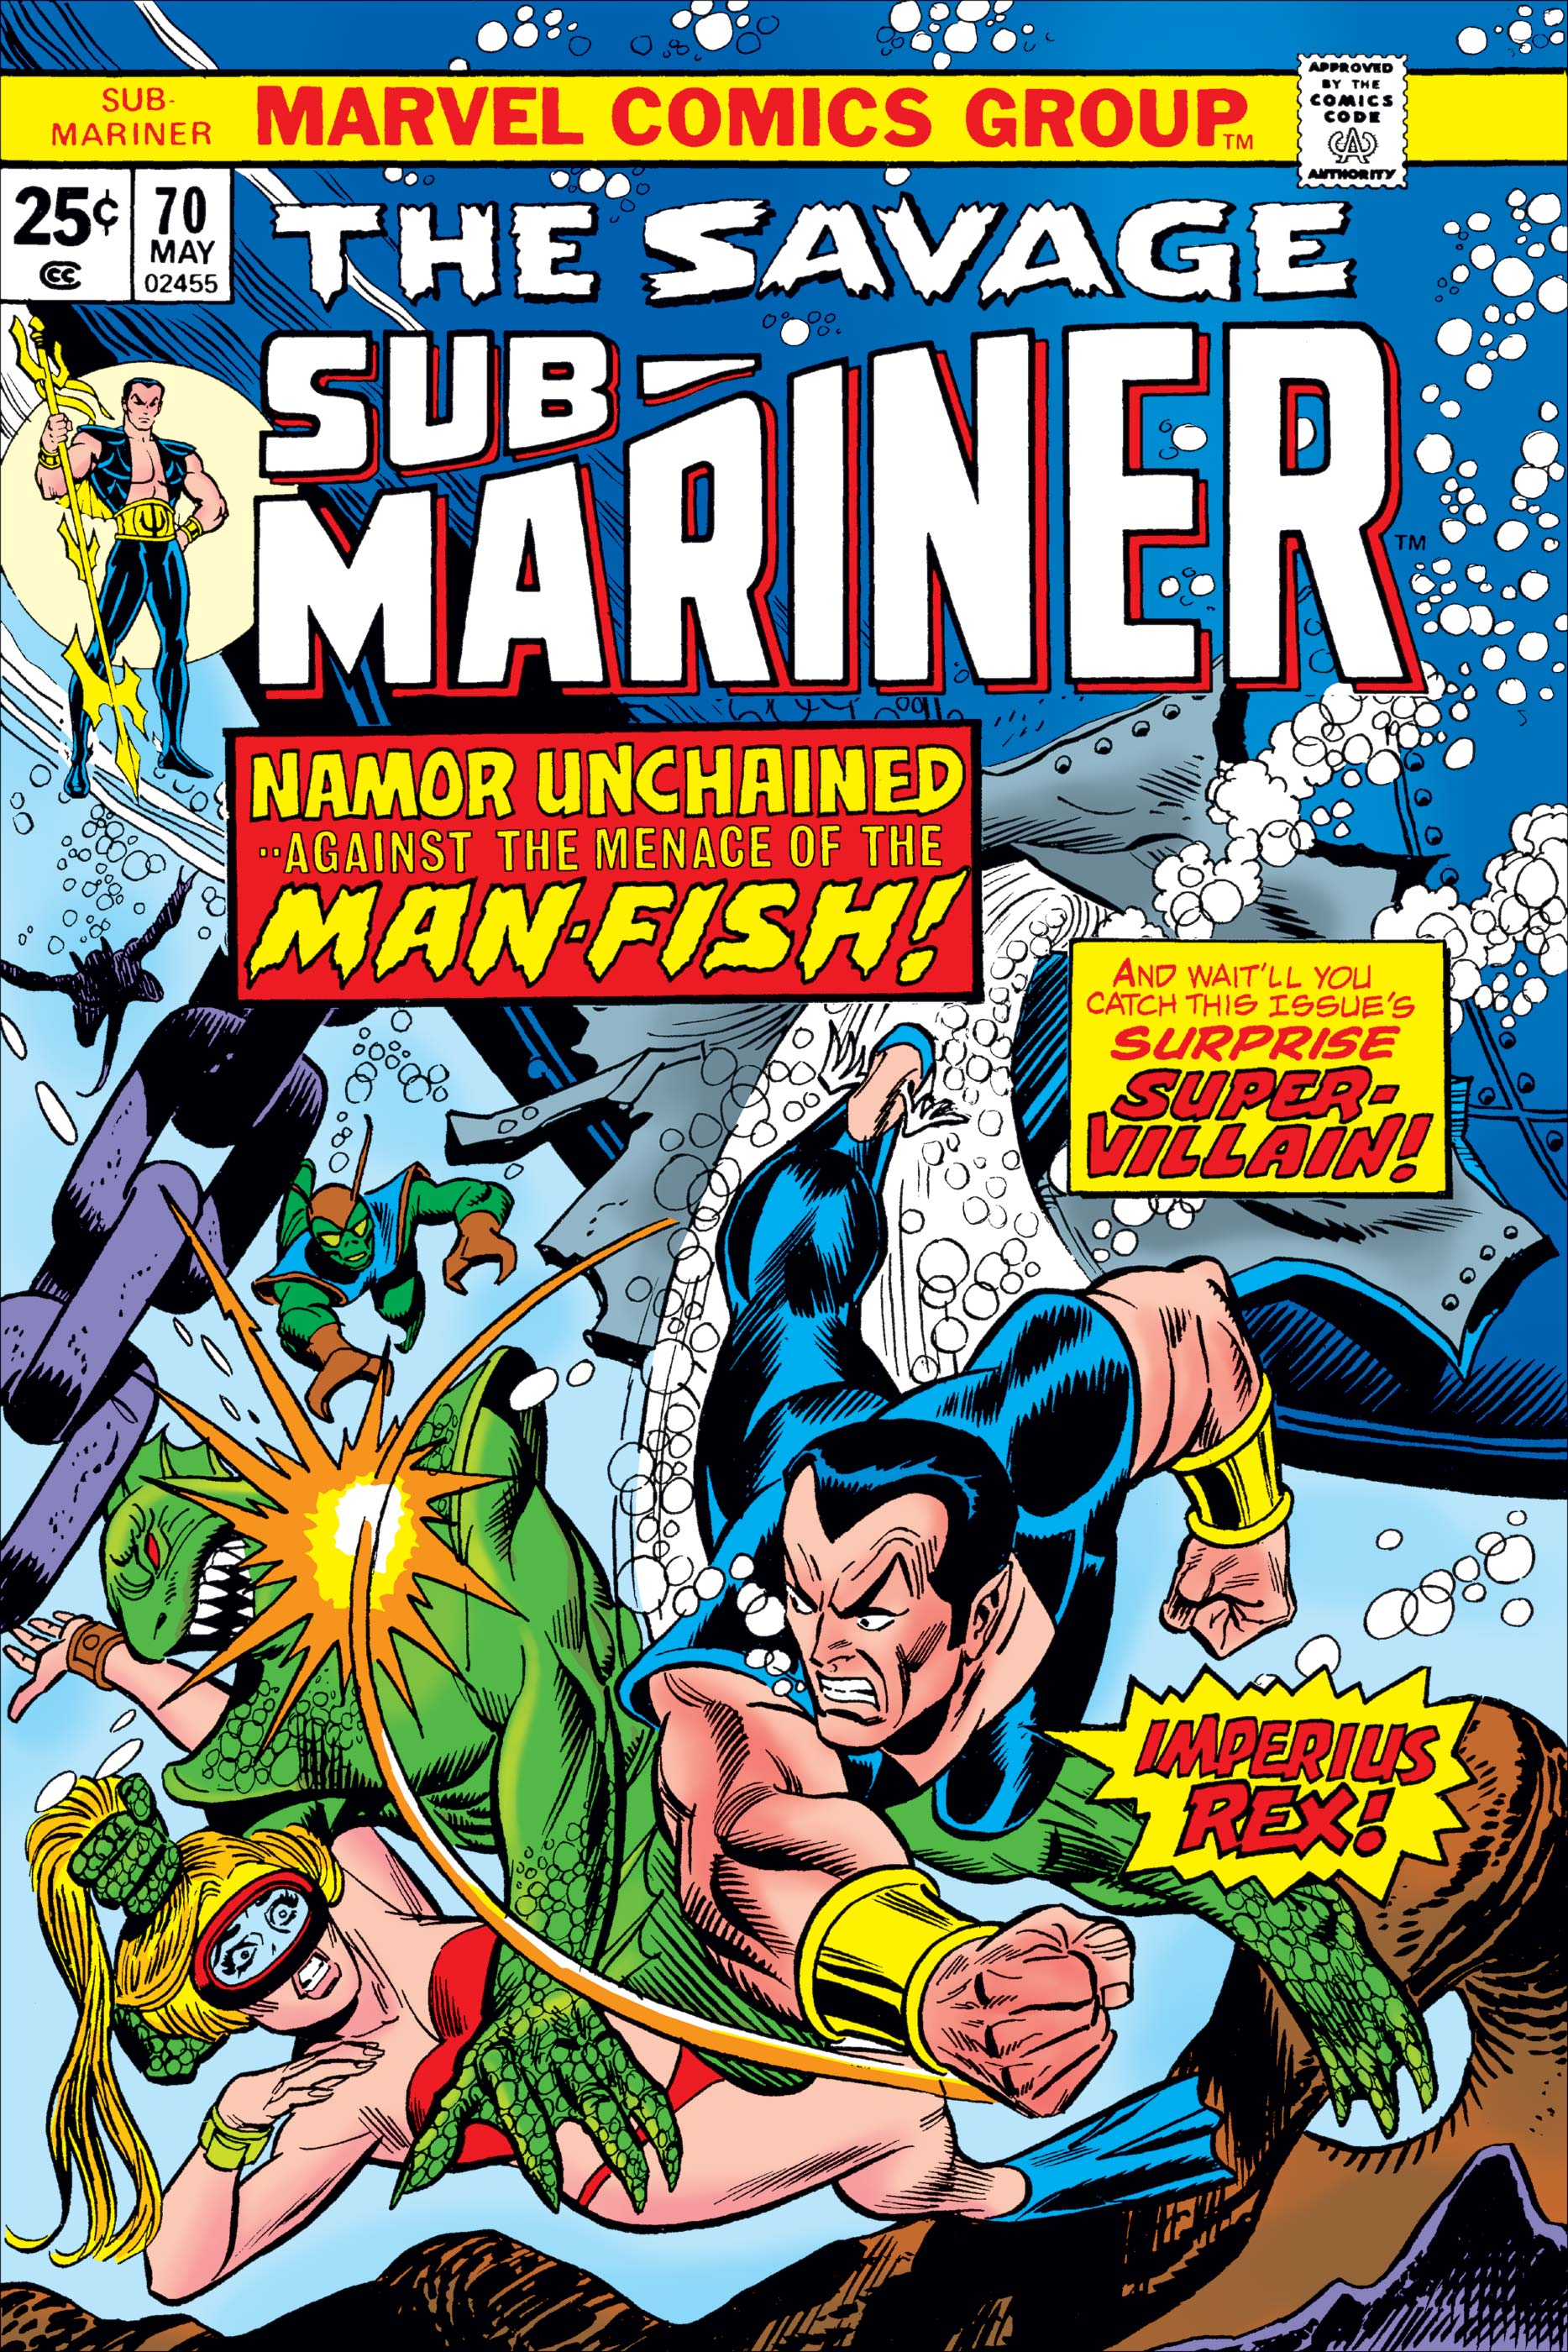 Sub-Mariner (1968) #70